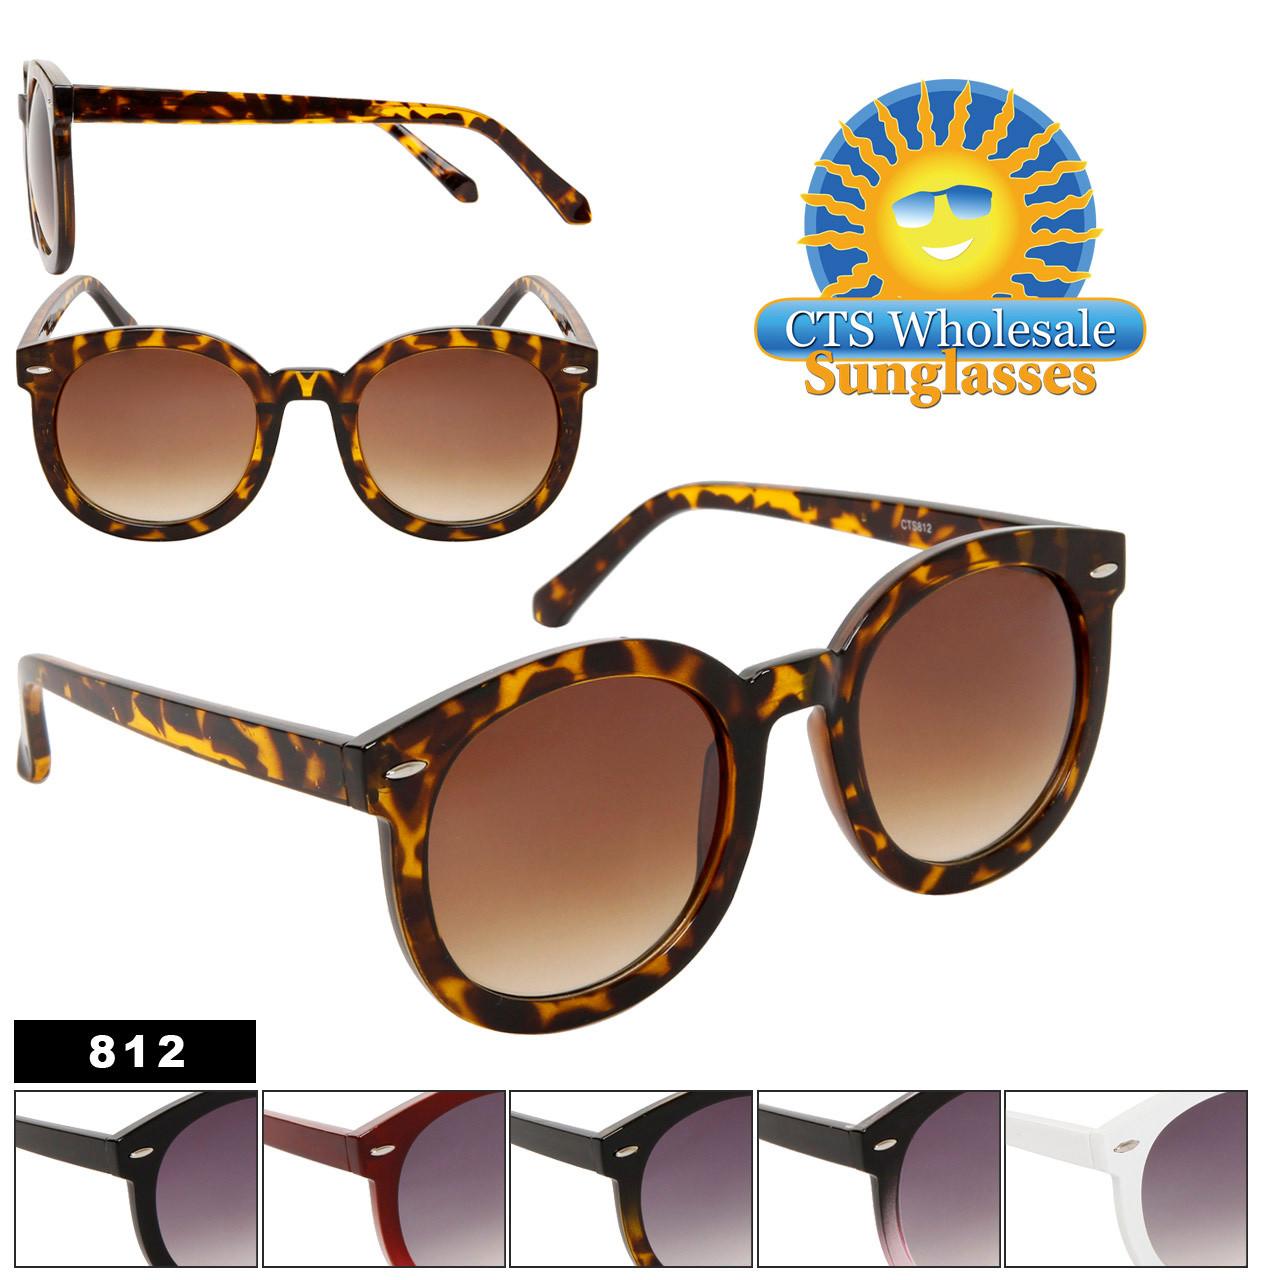 Round Fashion Sunglasses 812